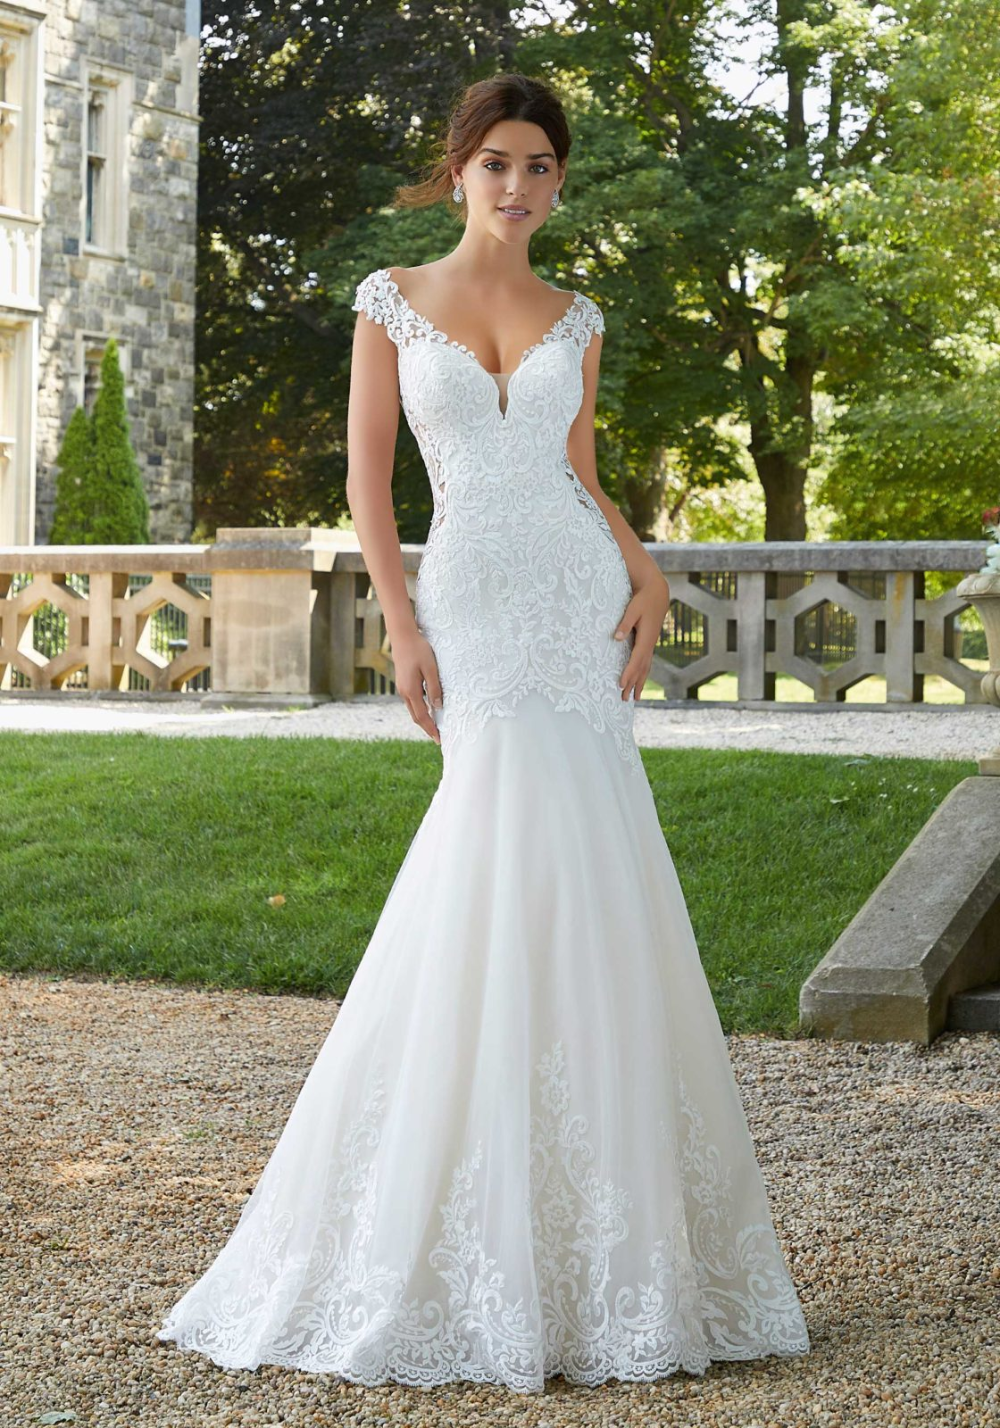 Shirley Wedding Dress Morilee Wedding Dresses Lace Mermaid Wedding Dress Wedding Dresses [ 1428 x 1000 Pixel ]